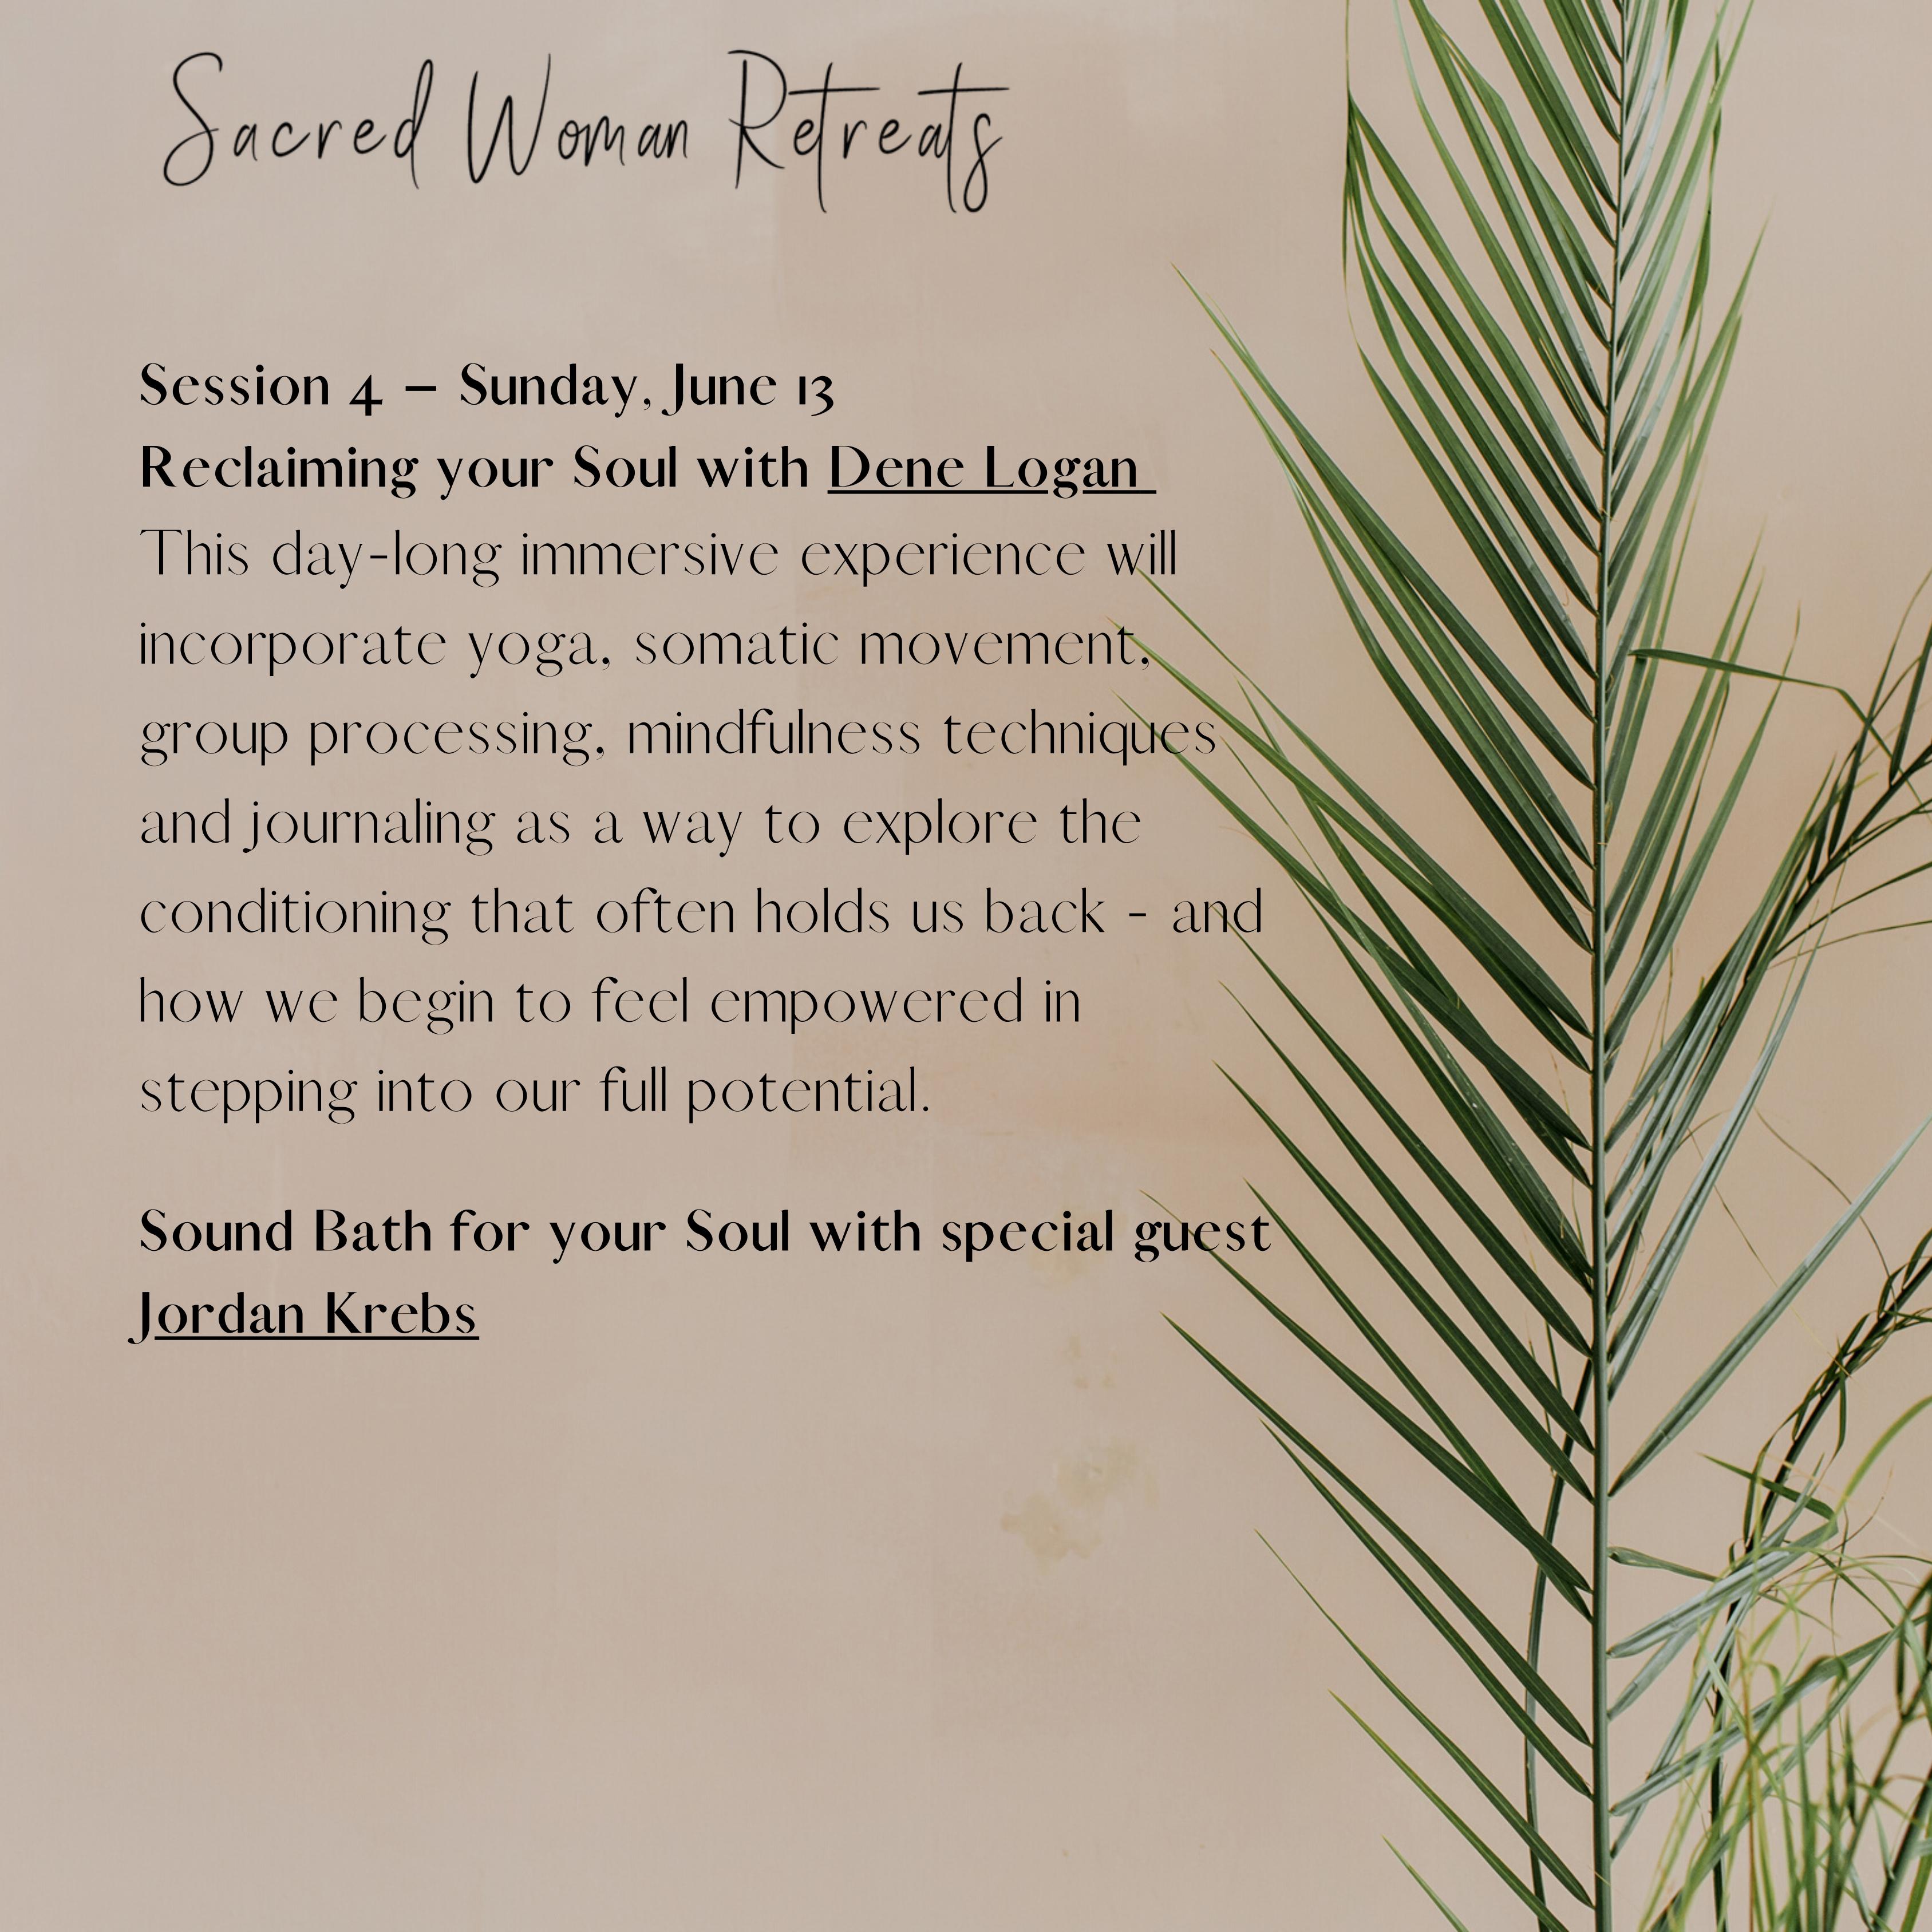 Women's Sacred Retreat | Day 4